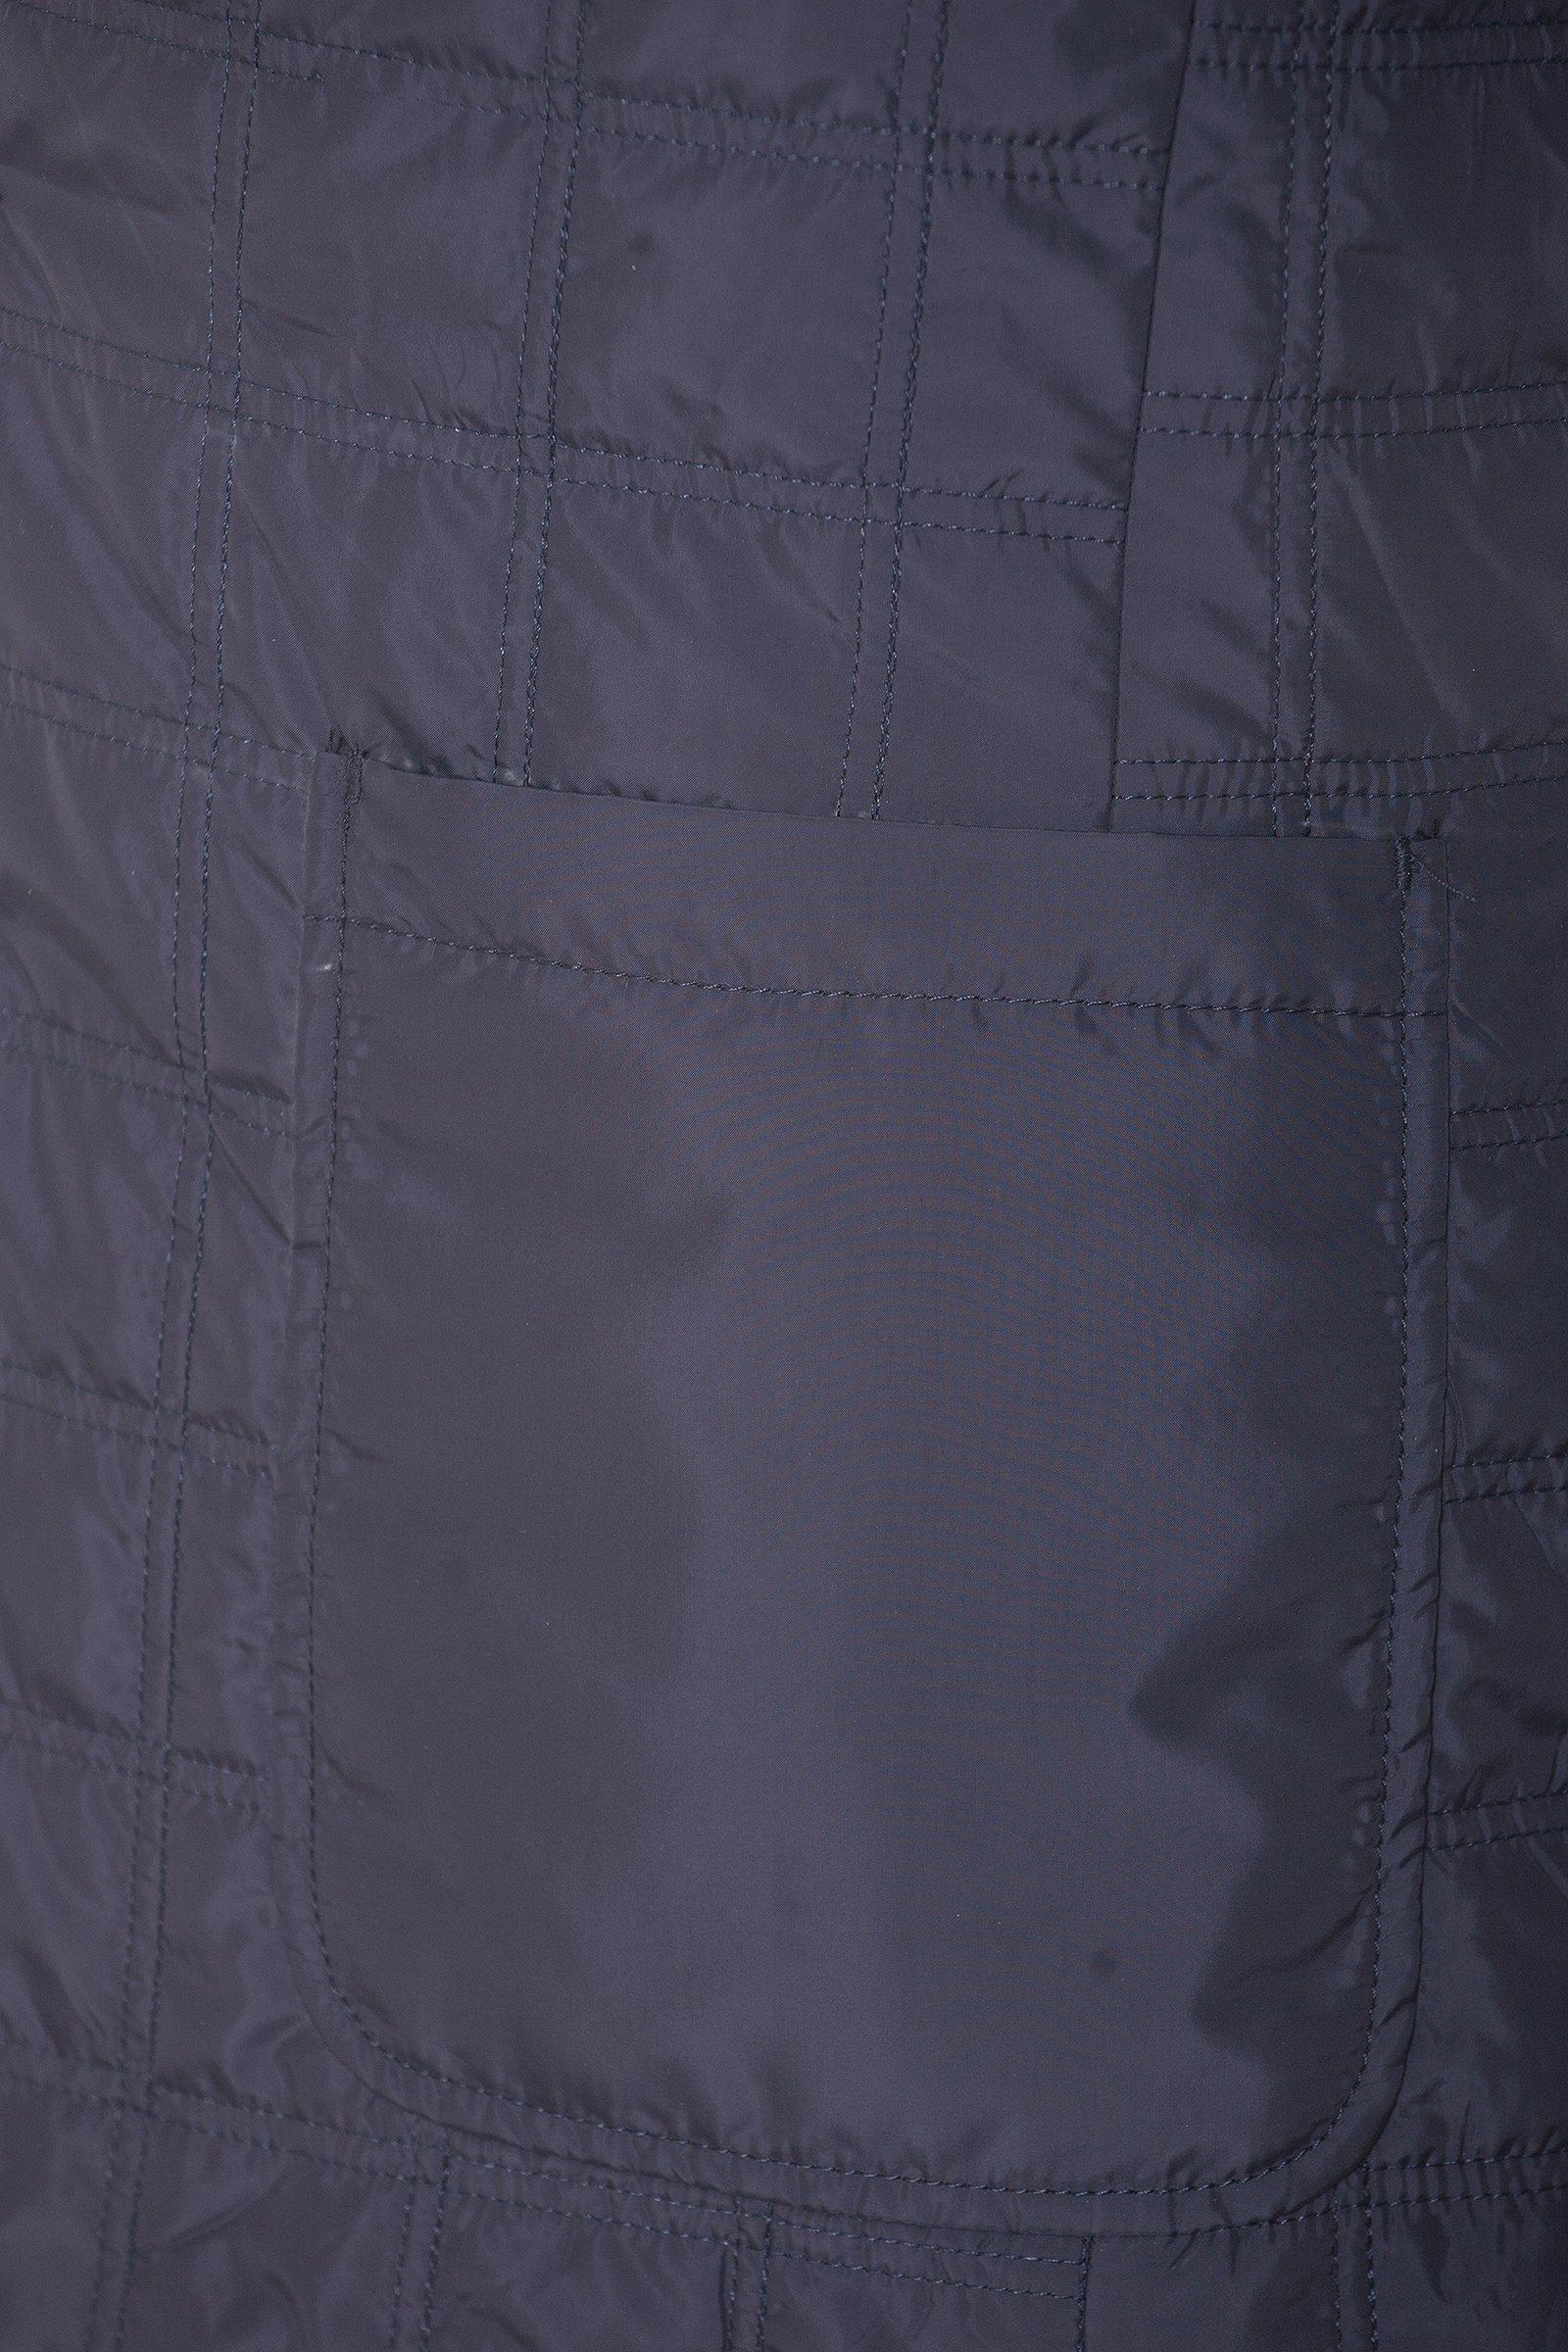 Geaca matlasata tip sacou cu maneci gri in carouri din lana